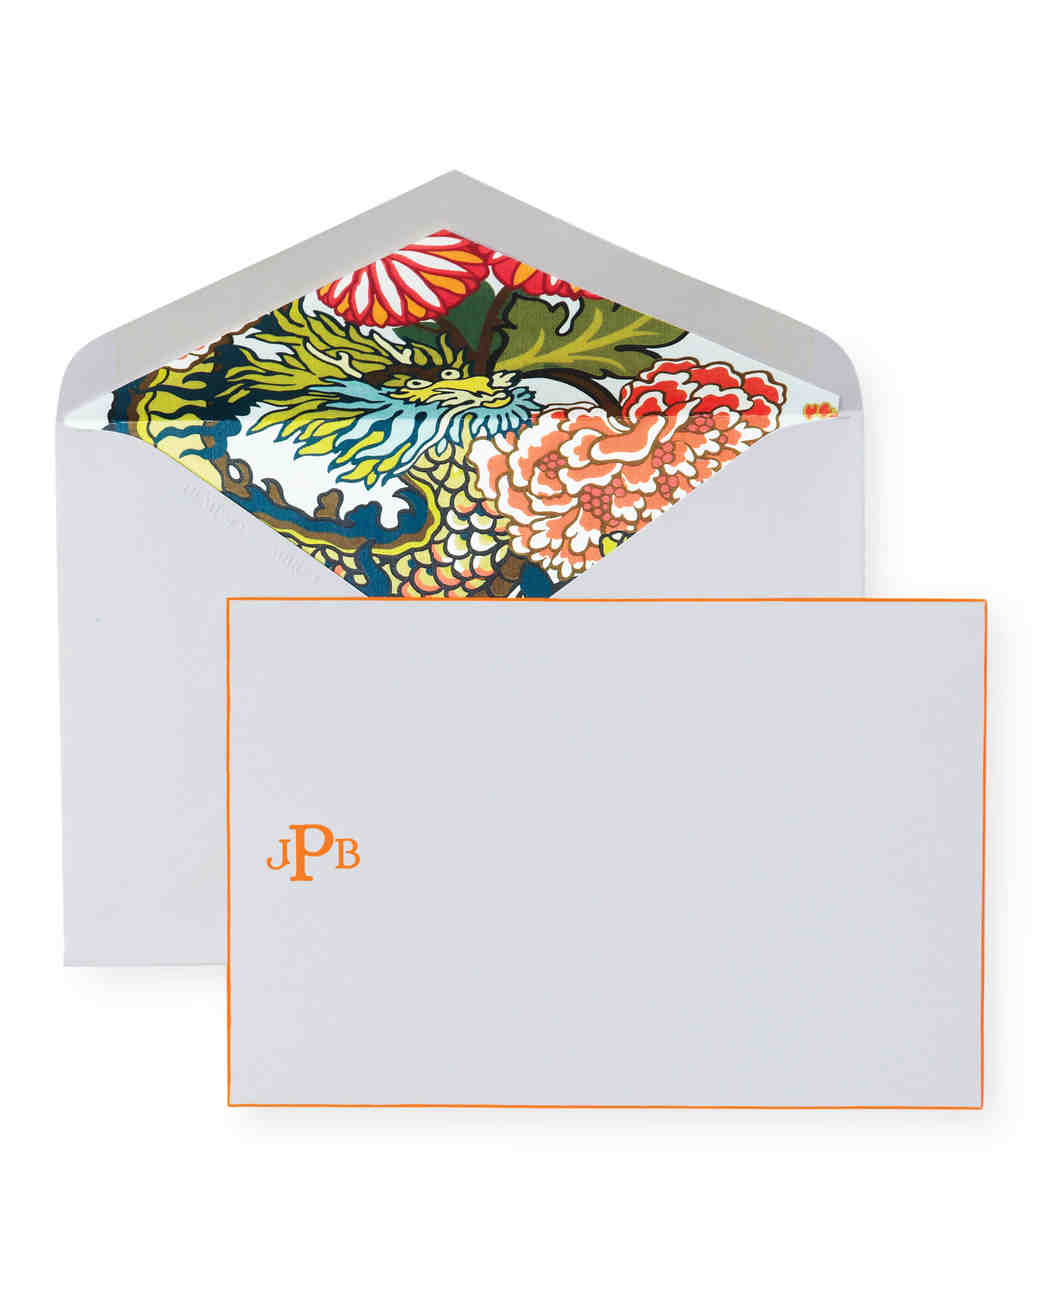 stationery-020-mwd110052.jpg